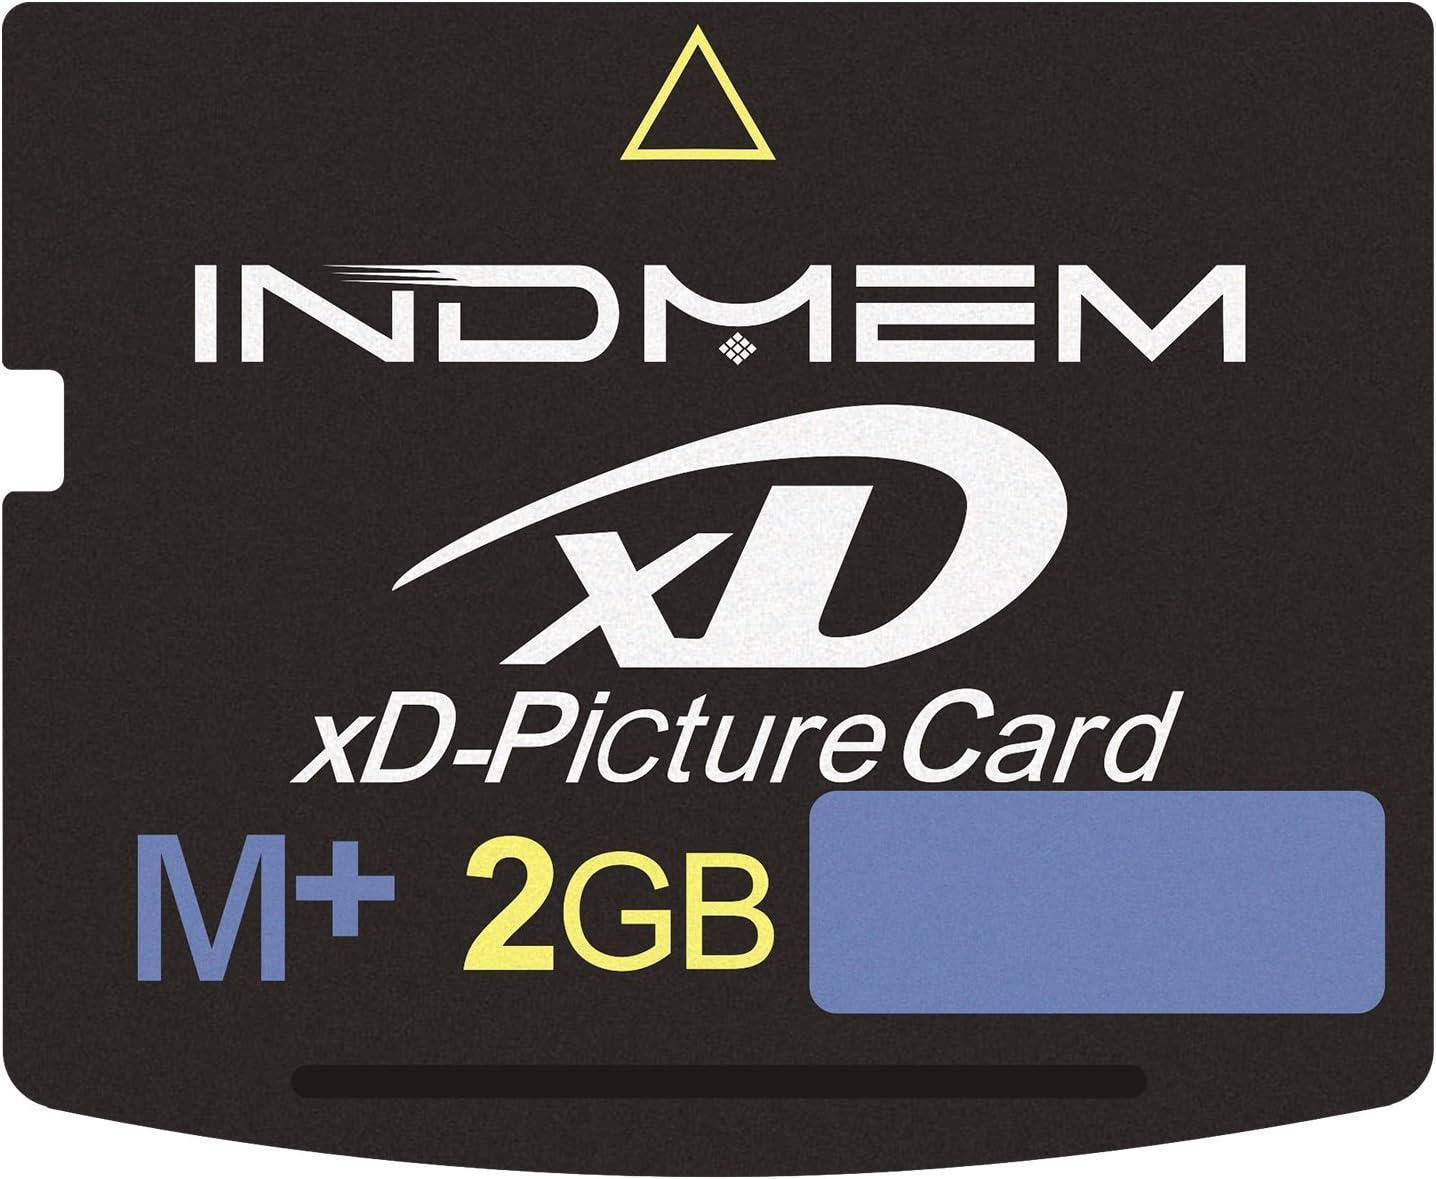 Xd Picture Card 2gb Type M 2gb Xd Flash Speicherkarte Für Olympus Fuji Fujifilm Digitalkamera Computer Zubehör